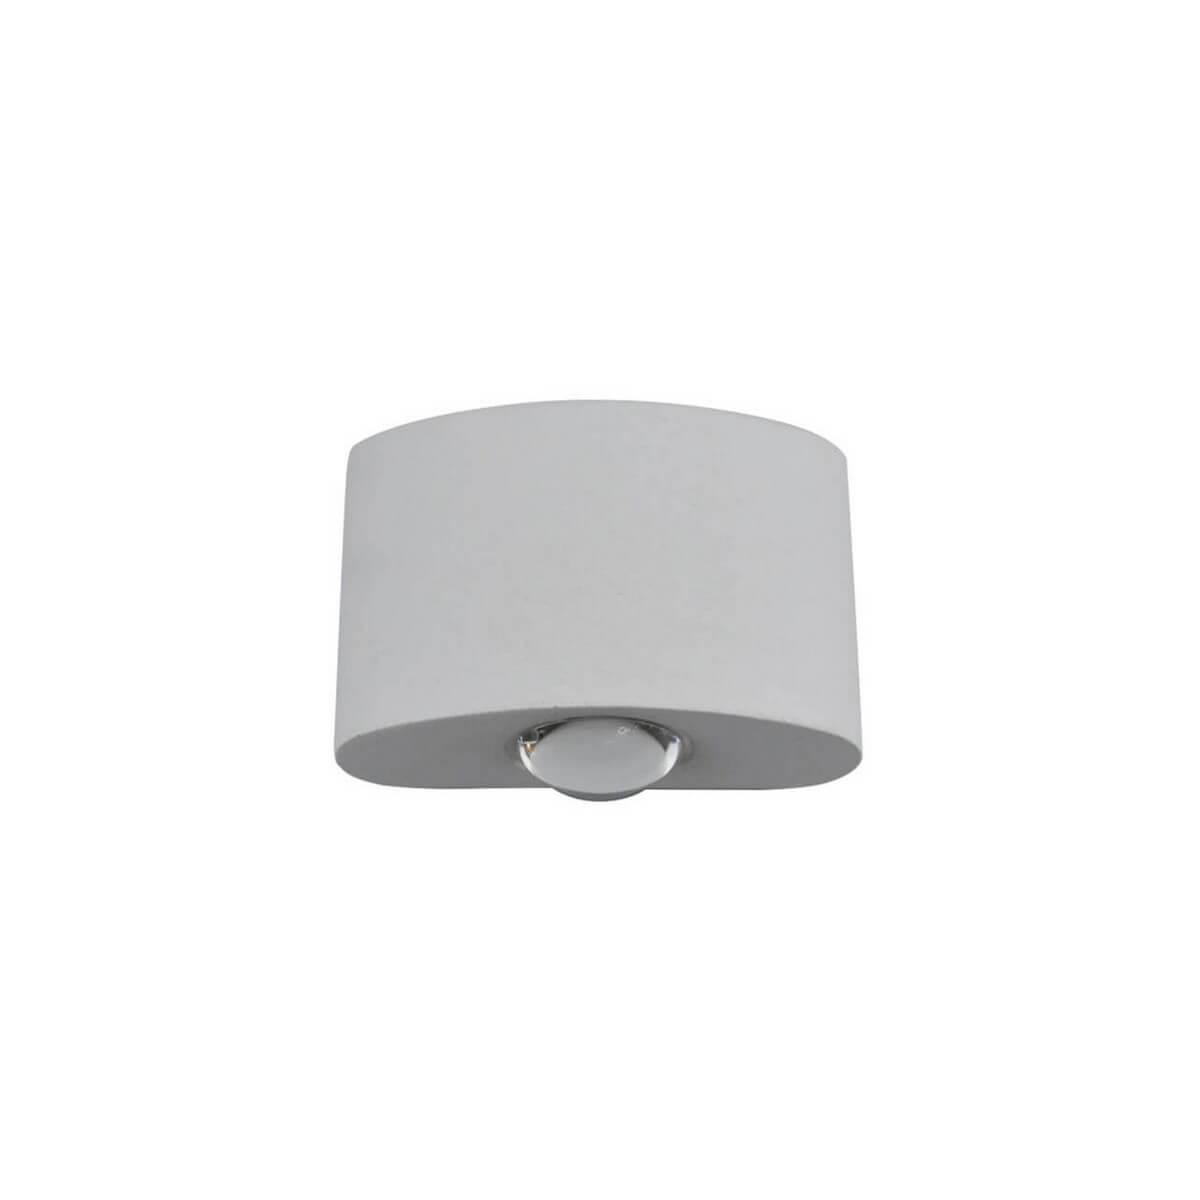 Уличный светильник Kink Light 08571,01, LED kink light настенный светильник italline ufo black gold